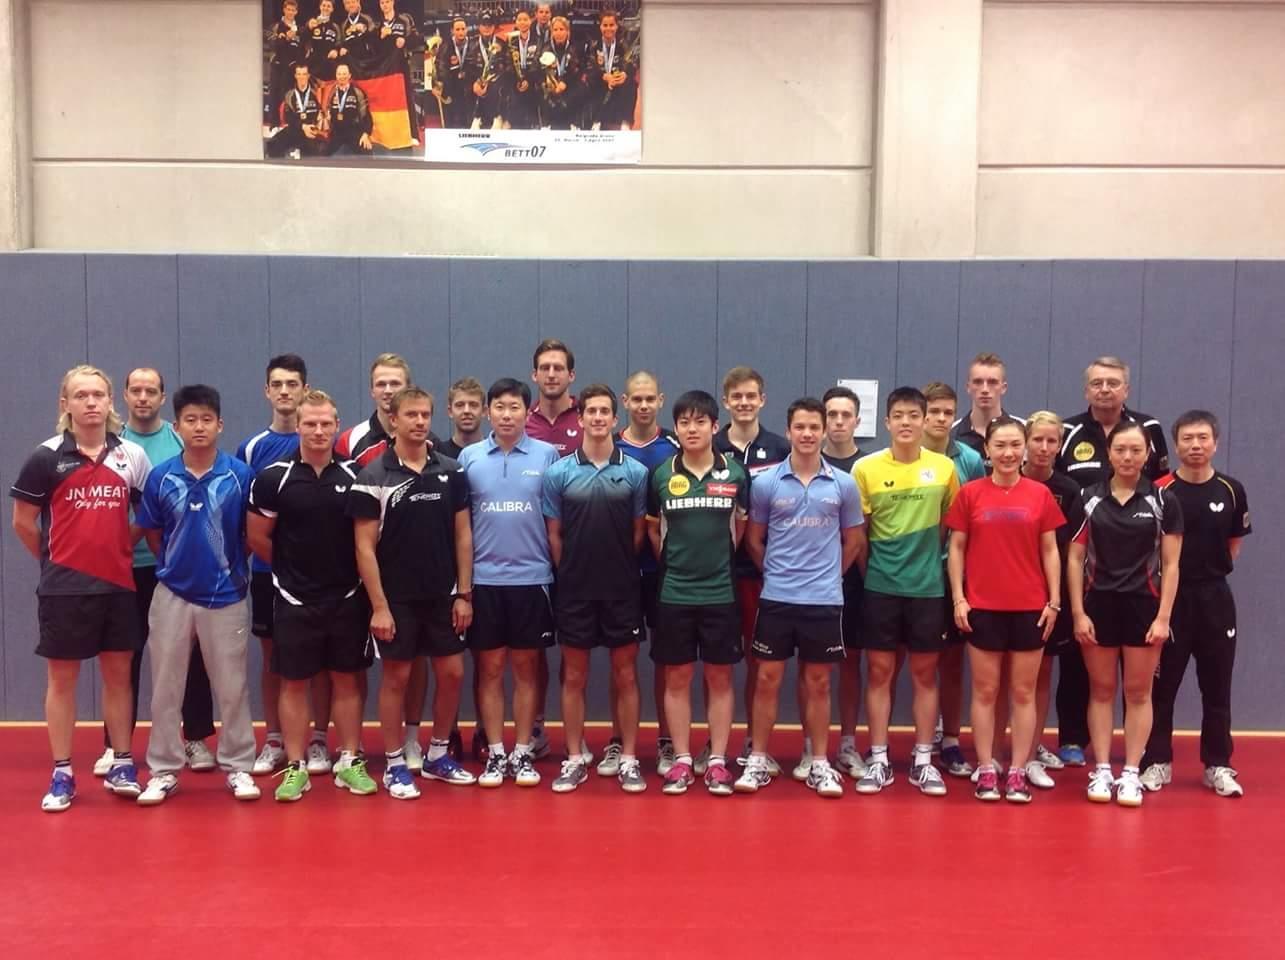 images/artikel/16-17/U23-Kader Dsseldorf Vorbereitung Sommer 2016.jpg